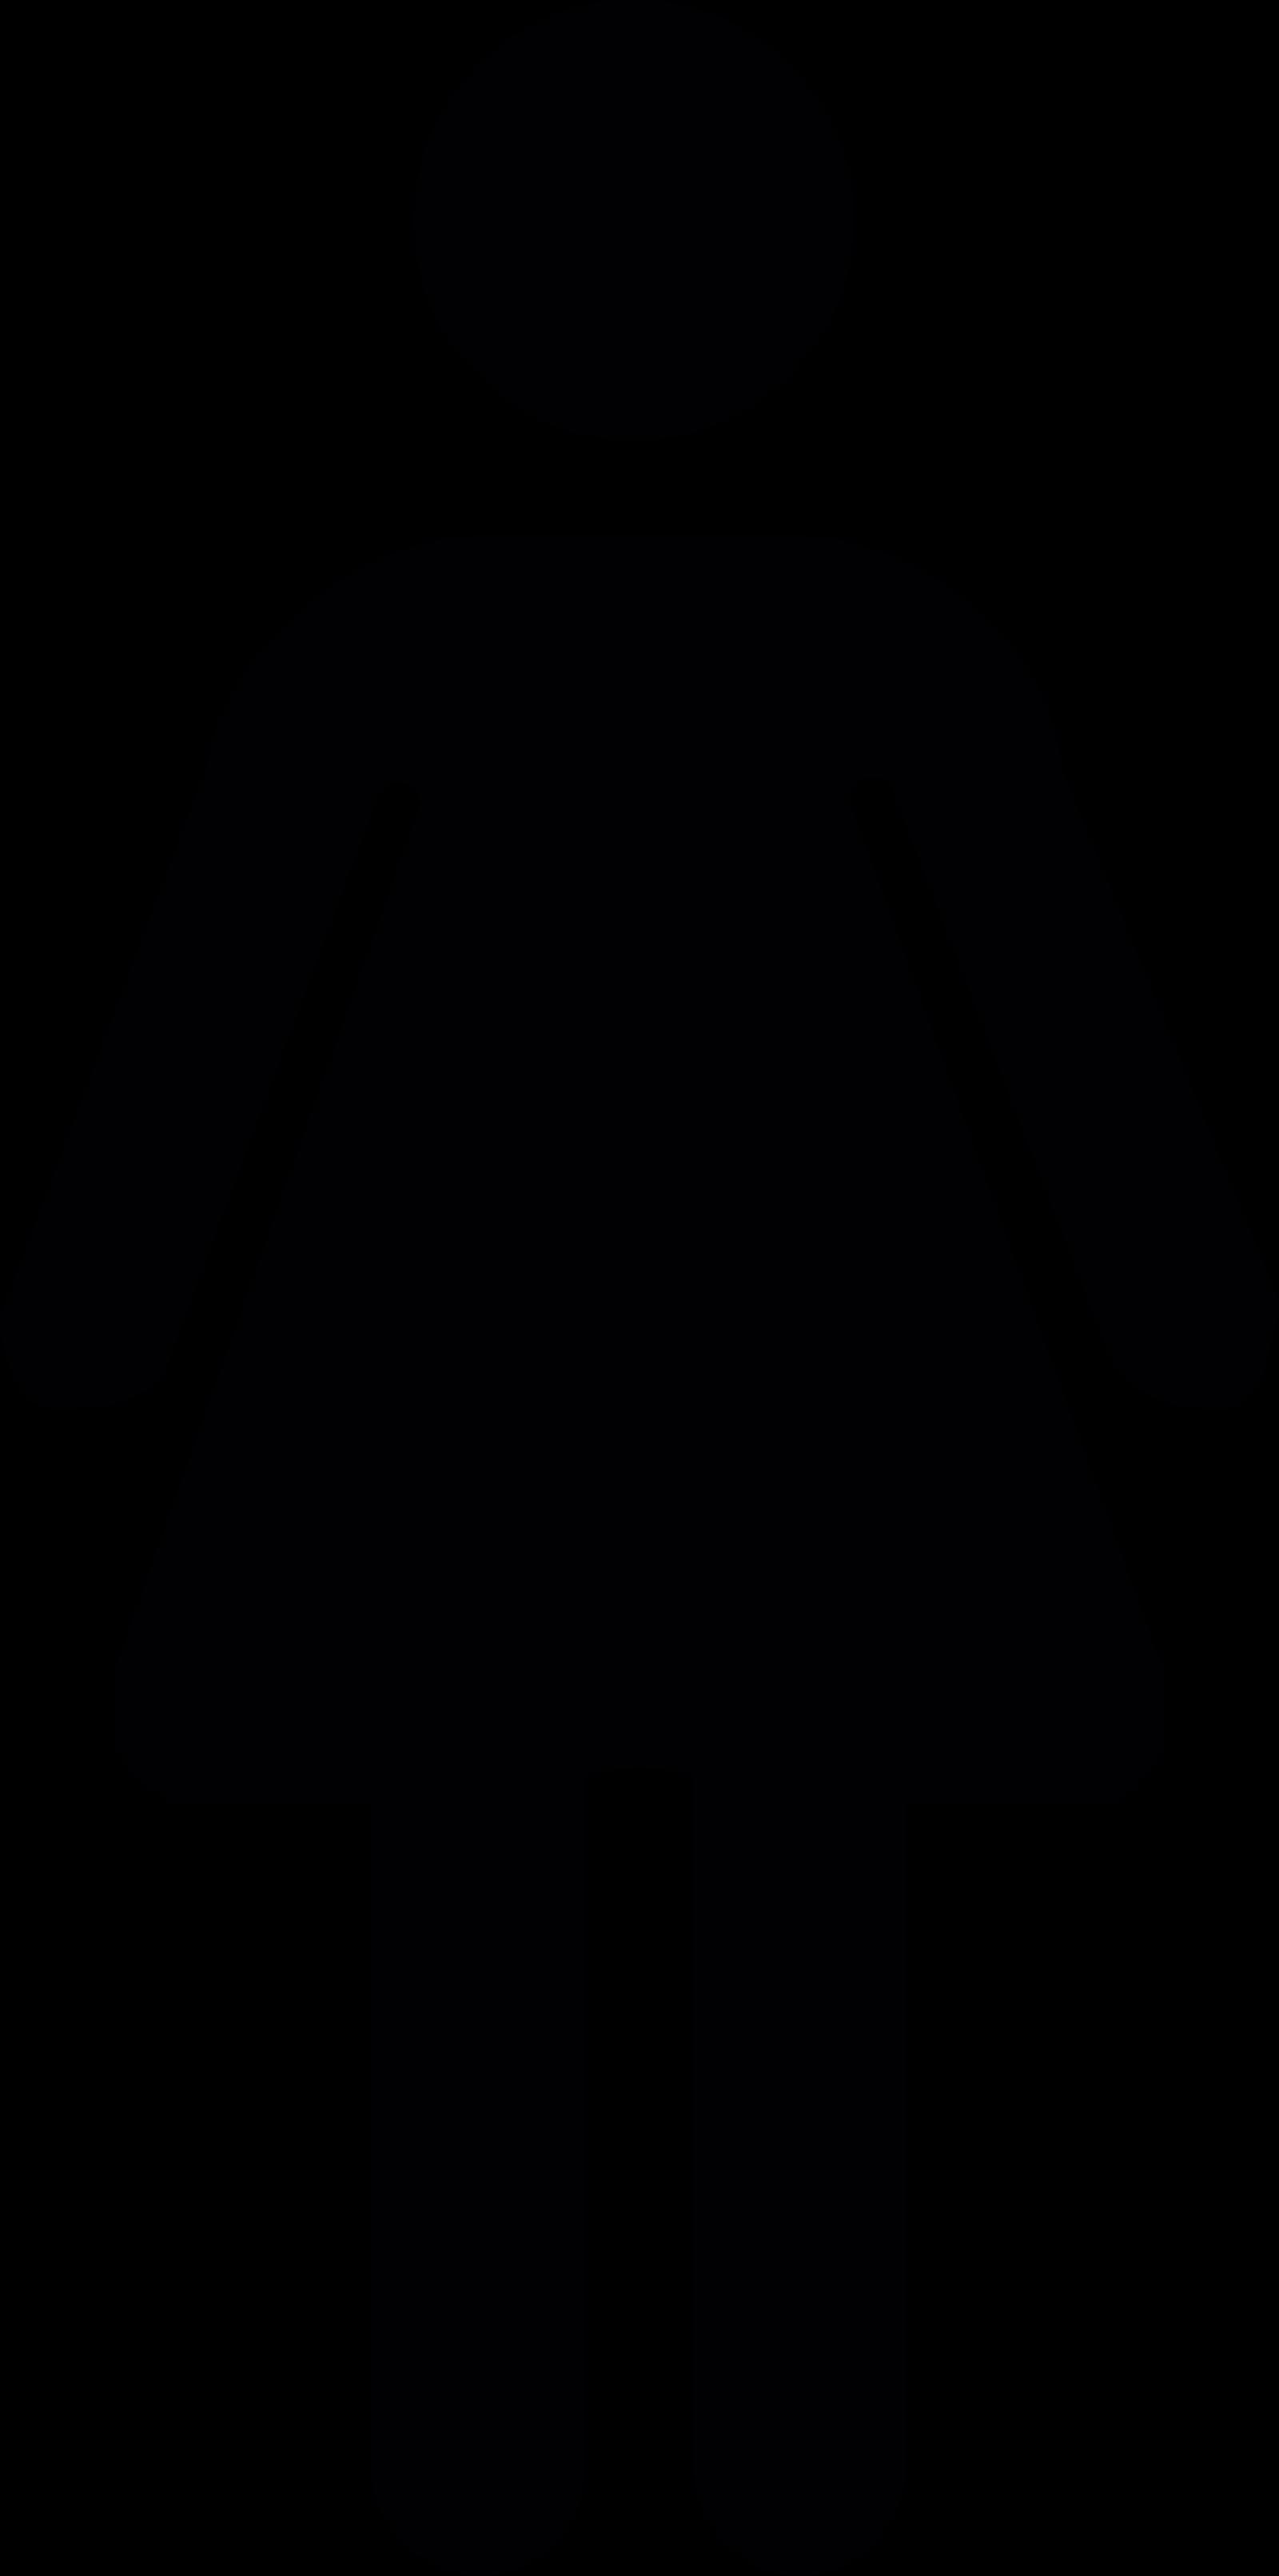 simbolo-banheiro-feminino-mulheres-2